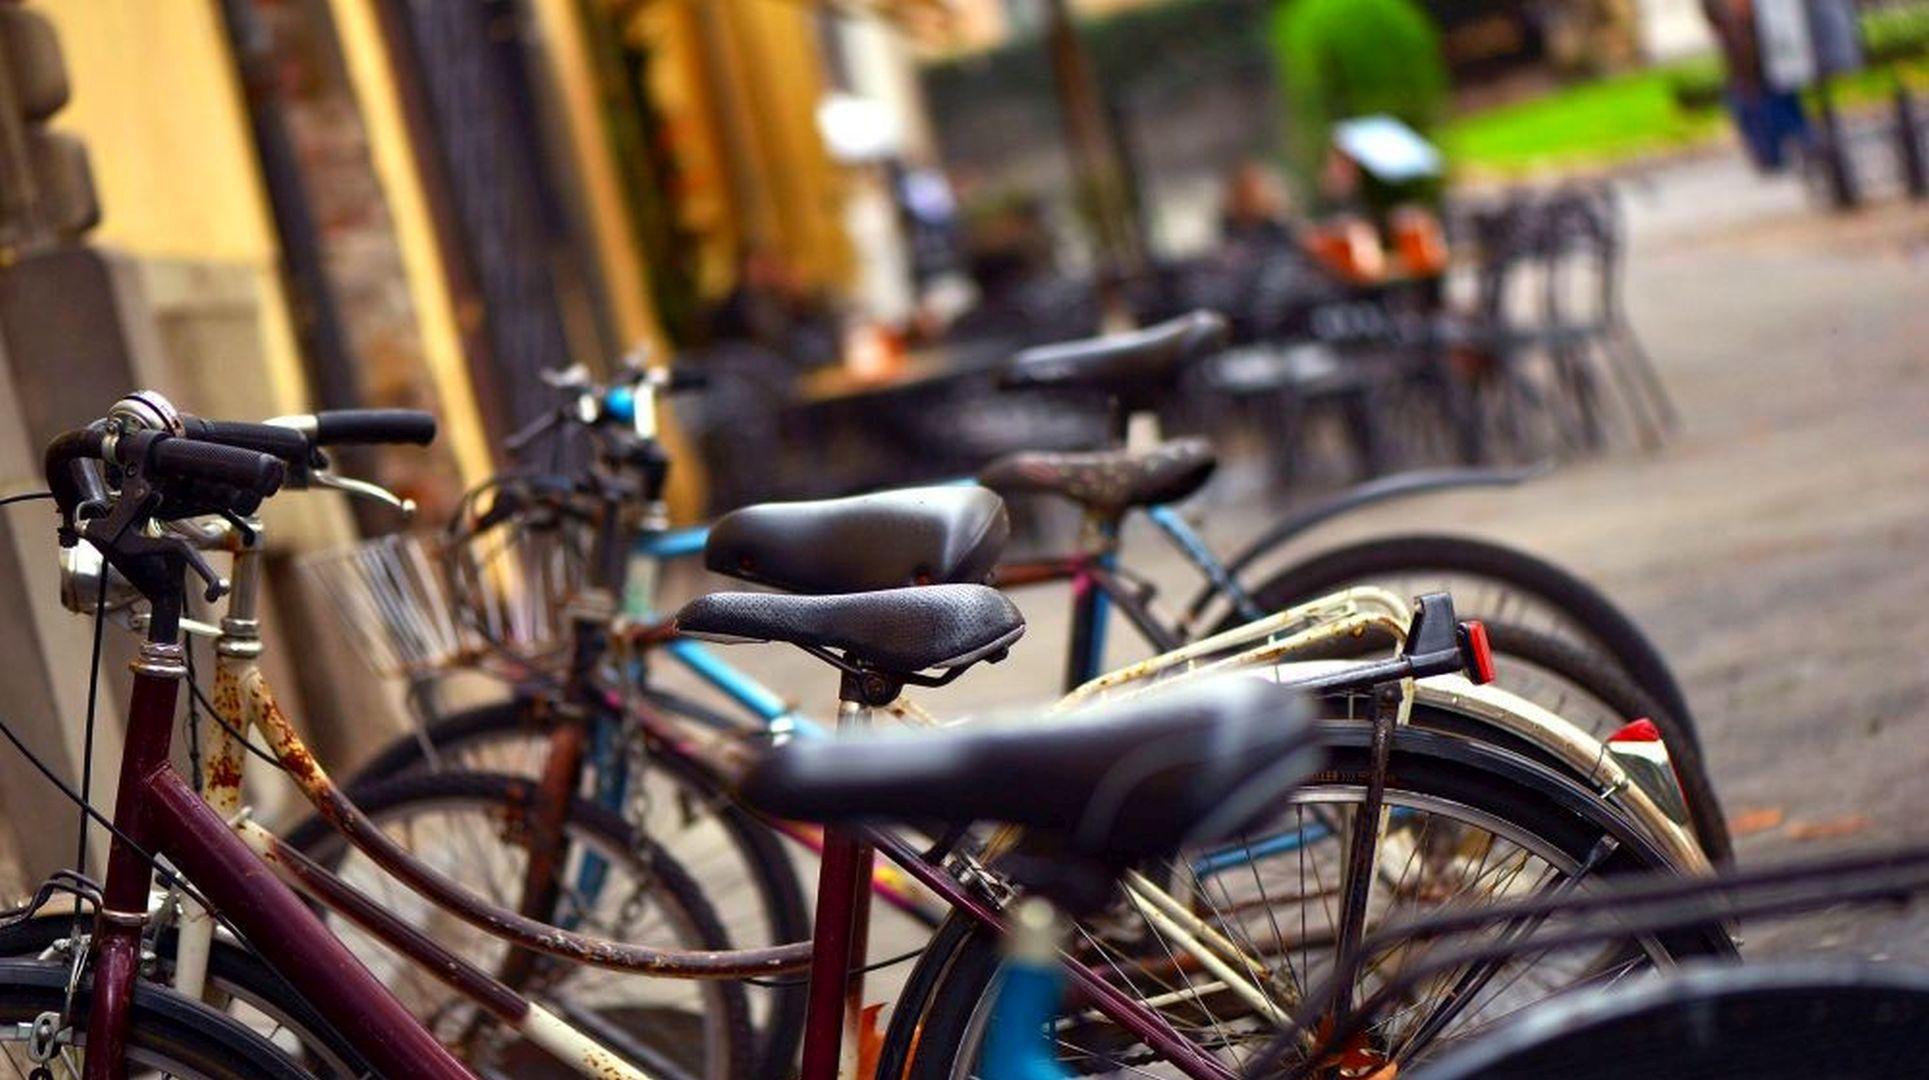 biciclette parcheggiate in piazza san Michele a Lucca